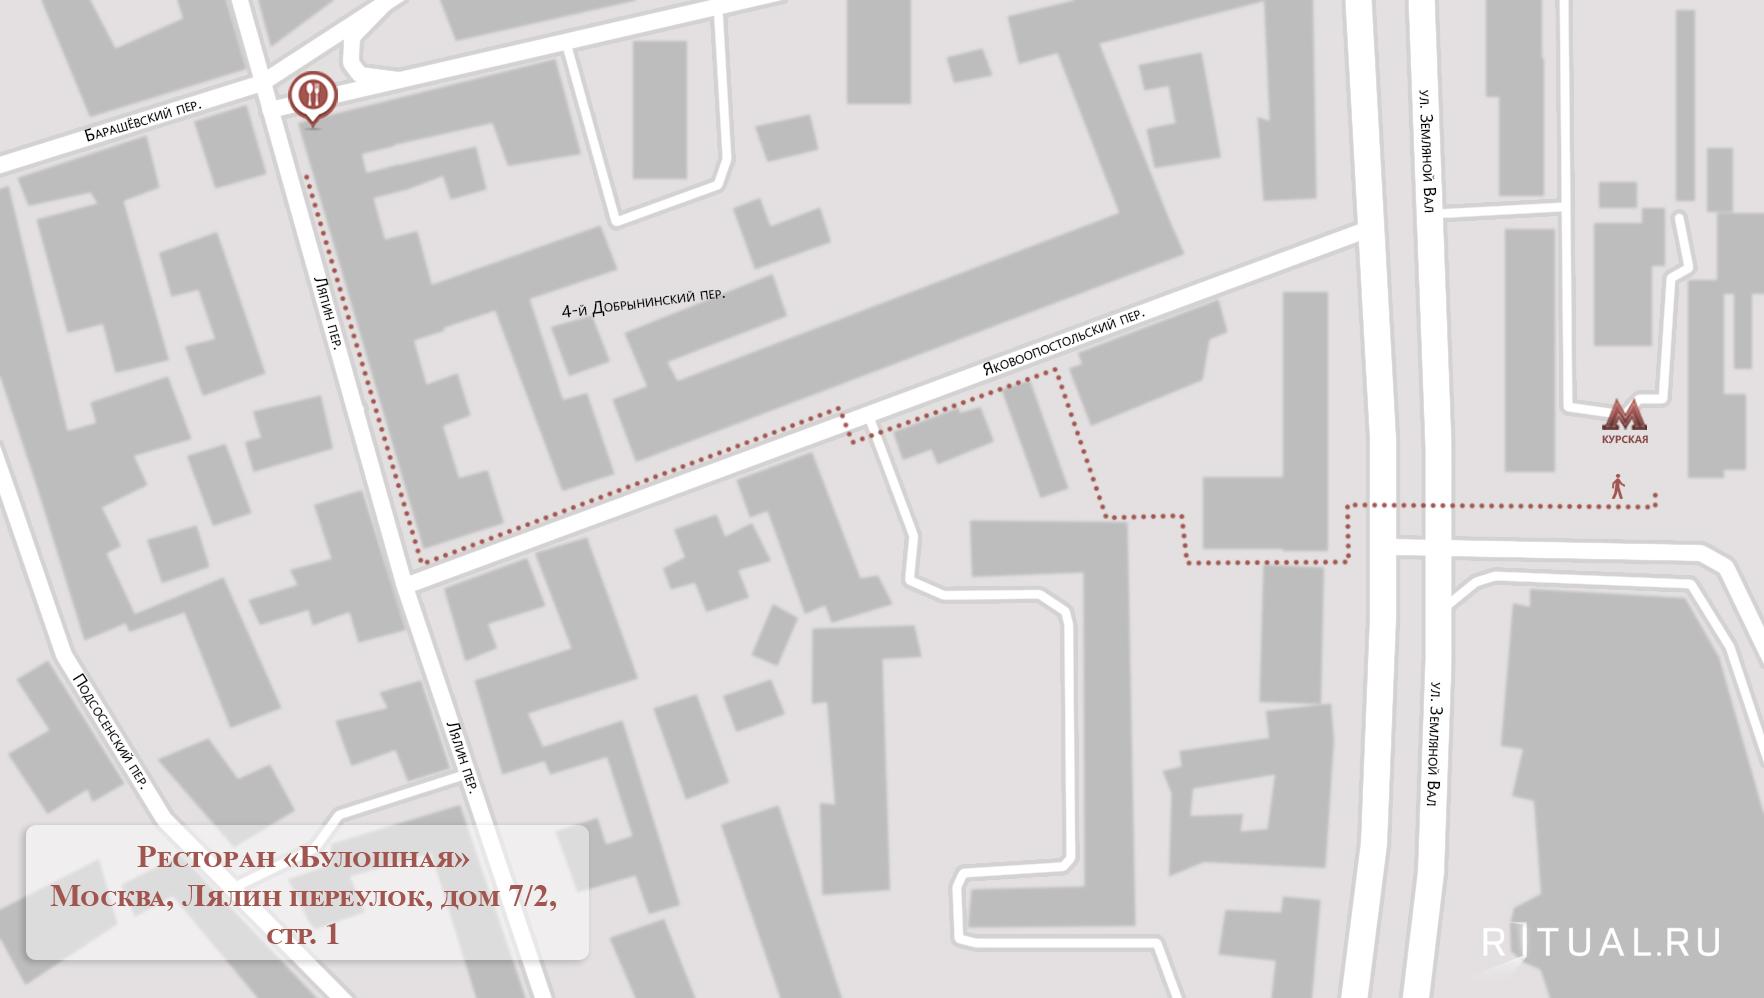 Схема проезда лялин переулок